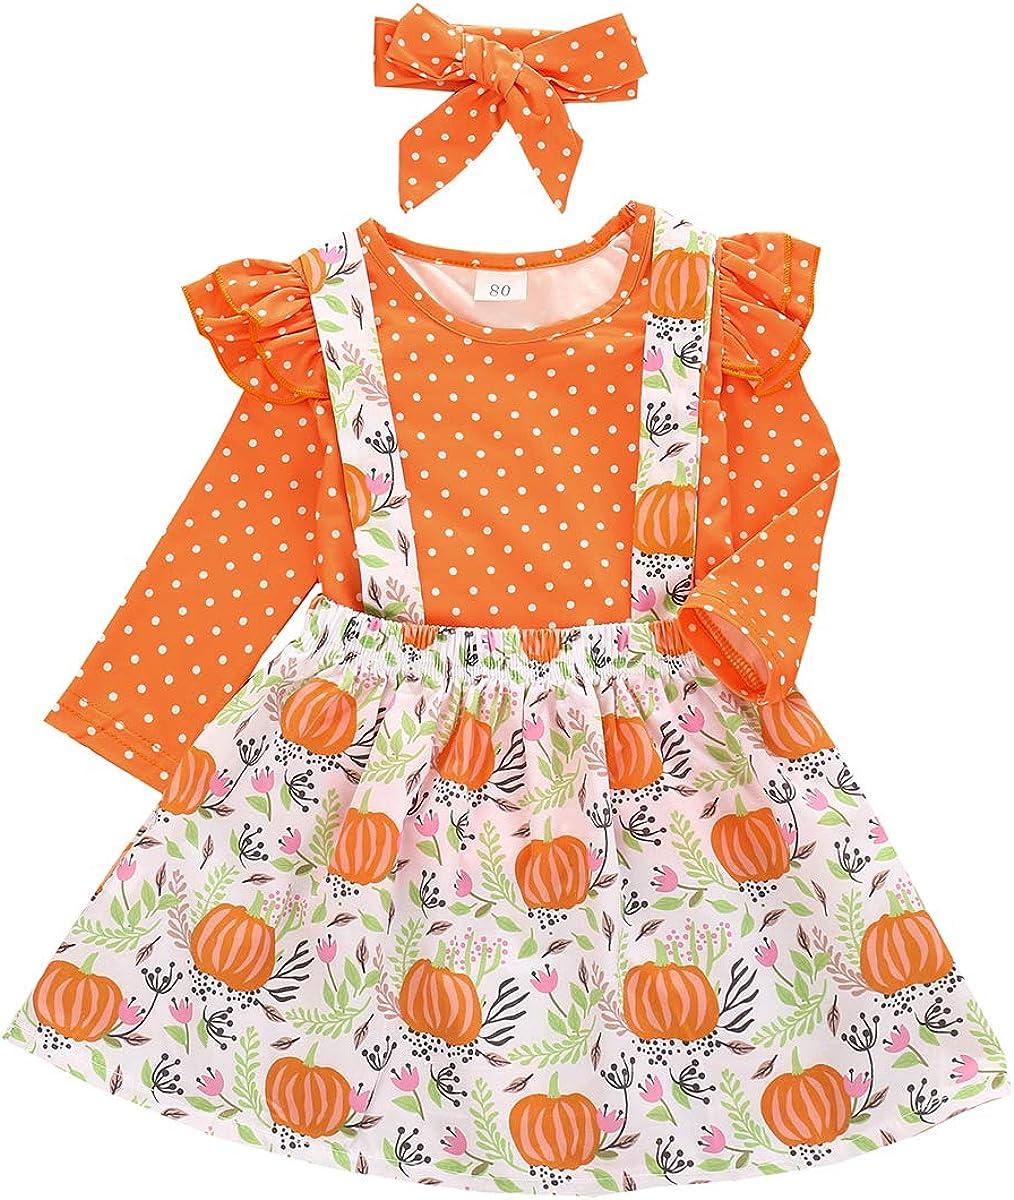 Baby Girl Halloween Ruffle Polka Dot Top Suspender Pumpkin Tutu Skirt Outfit Set with Headband